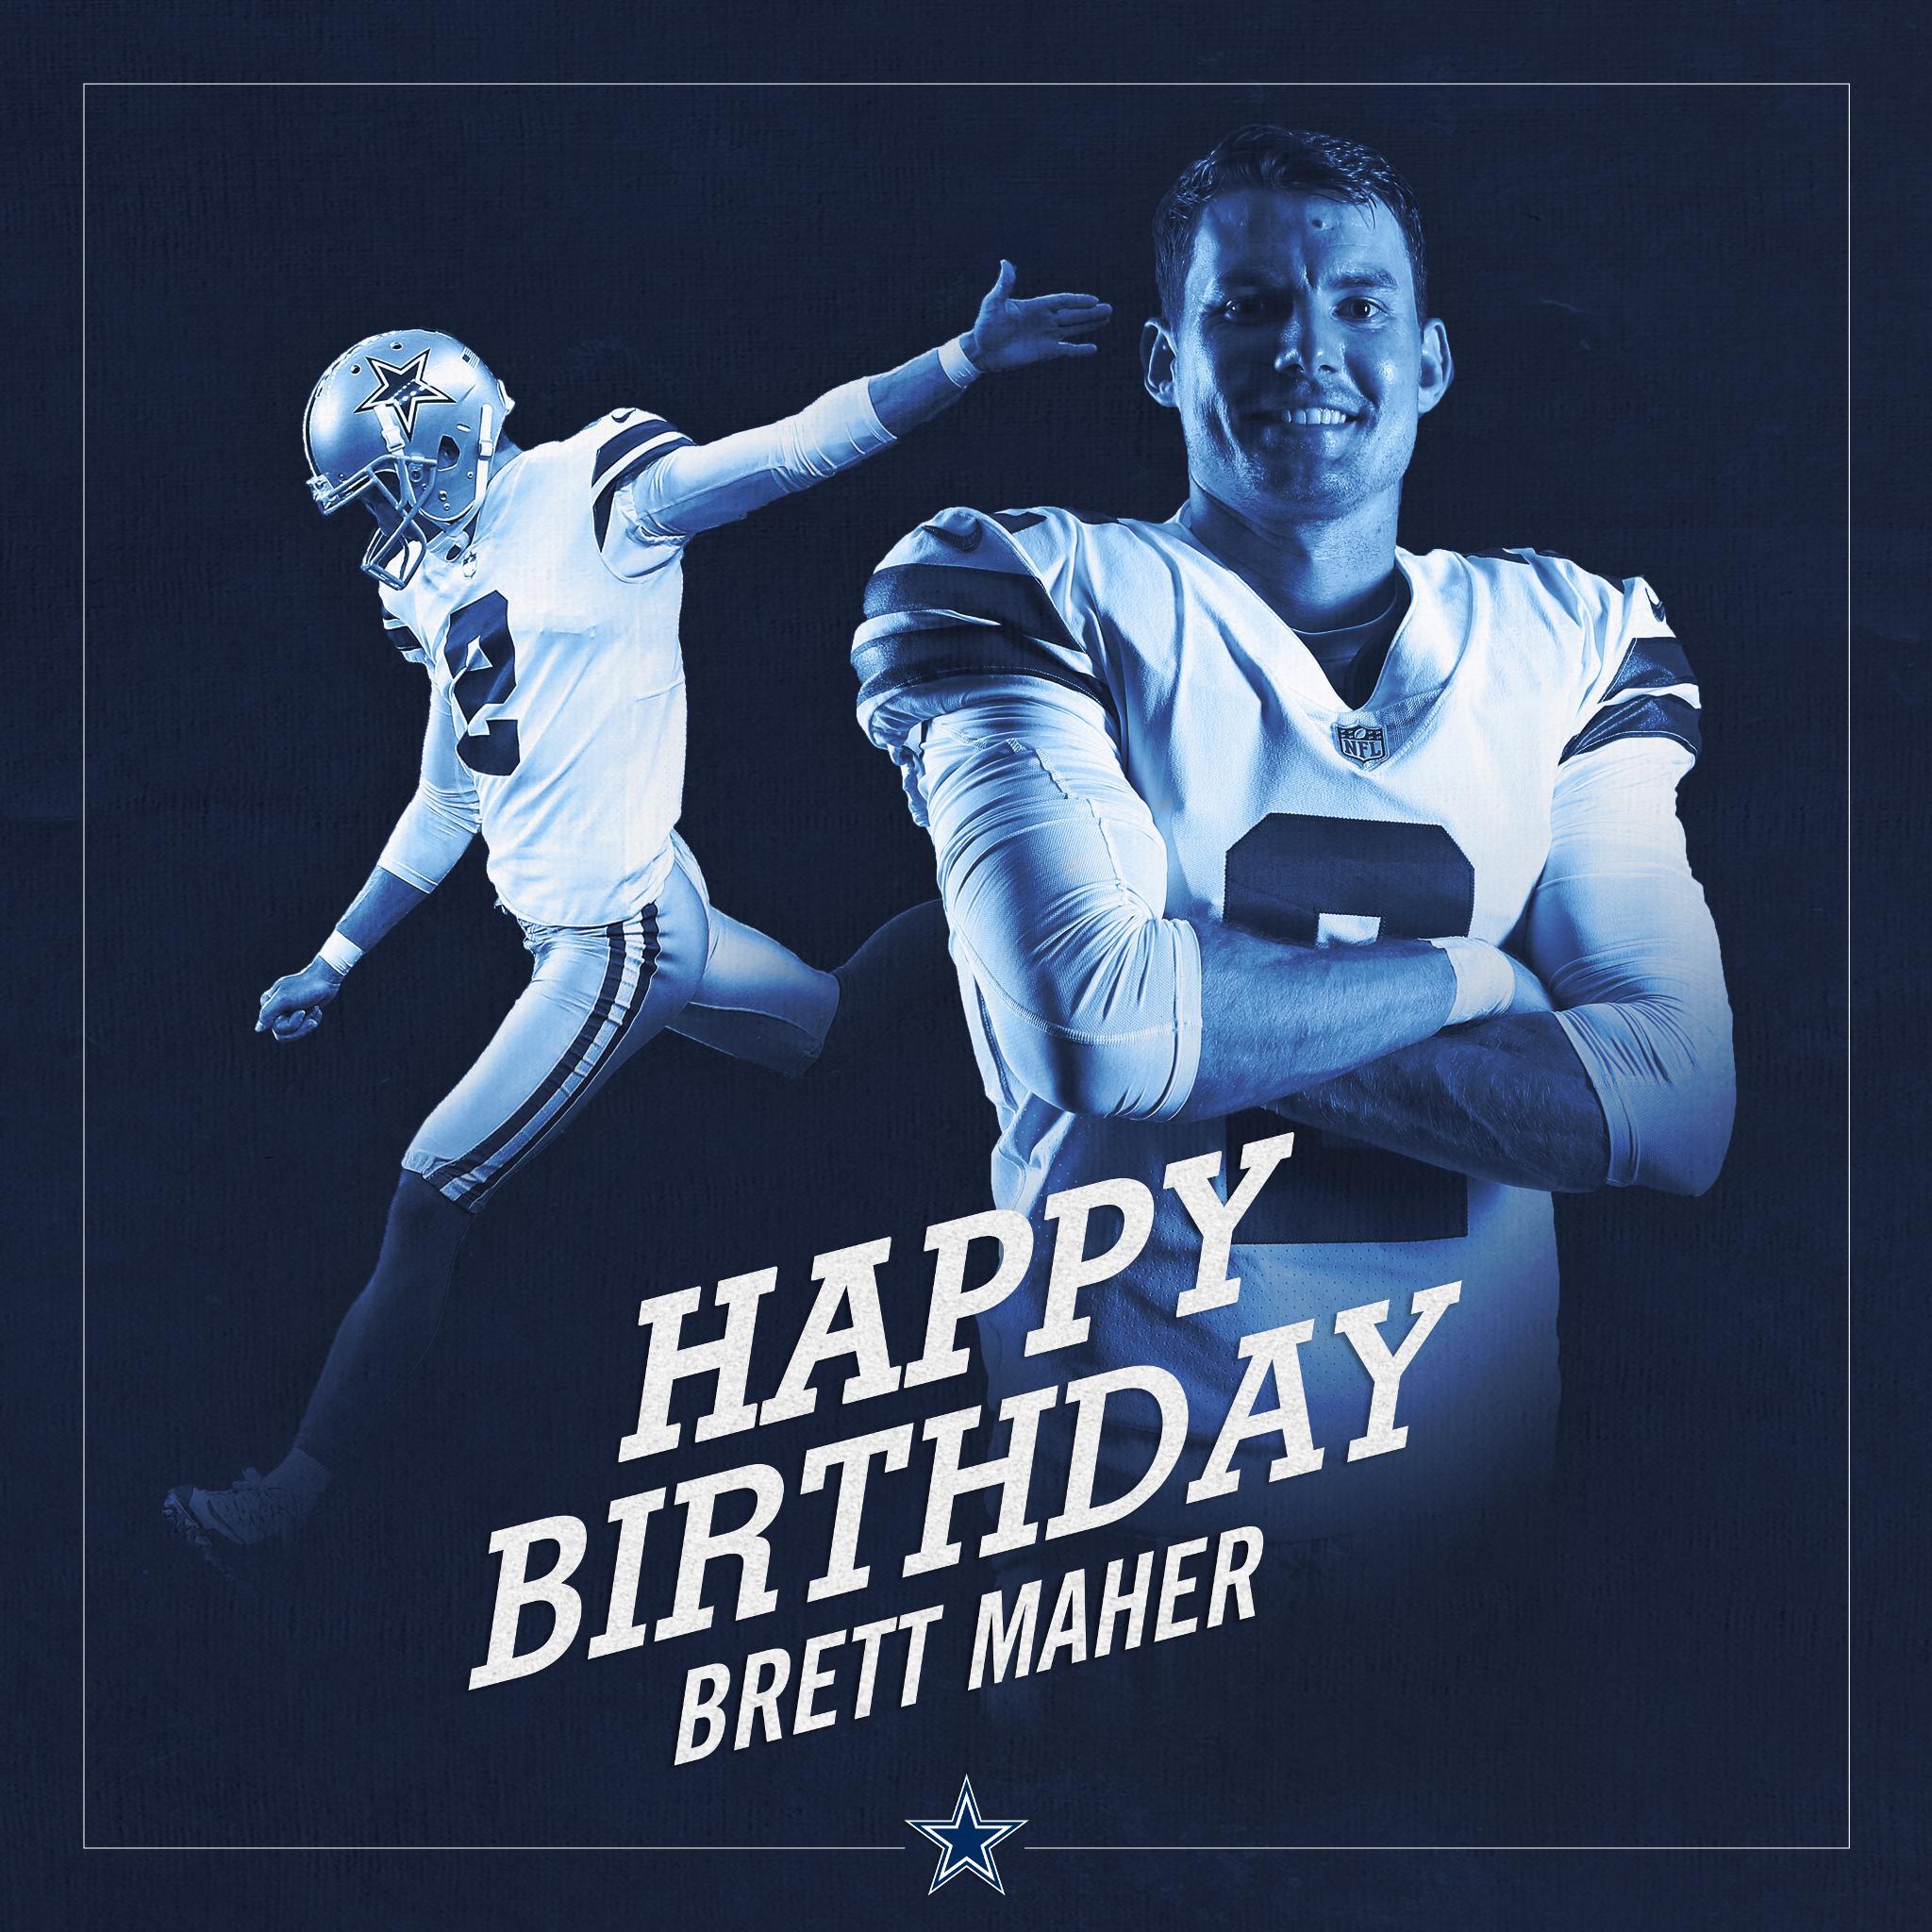 #CowboysNation, join us in wishing @brett_maher a happy birthday! https://t.co/NpQ4TLxTQu